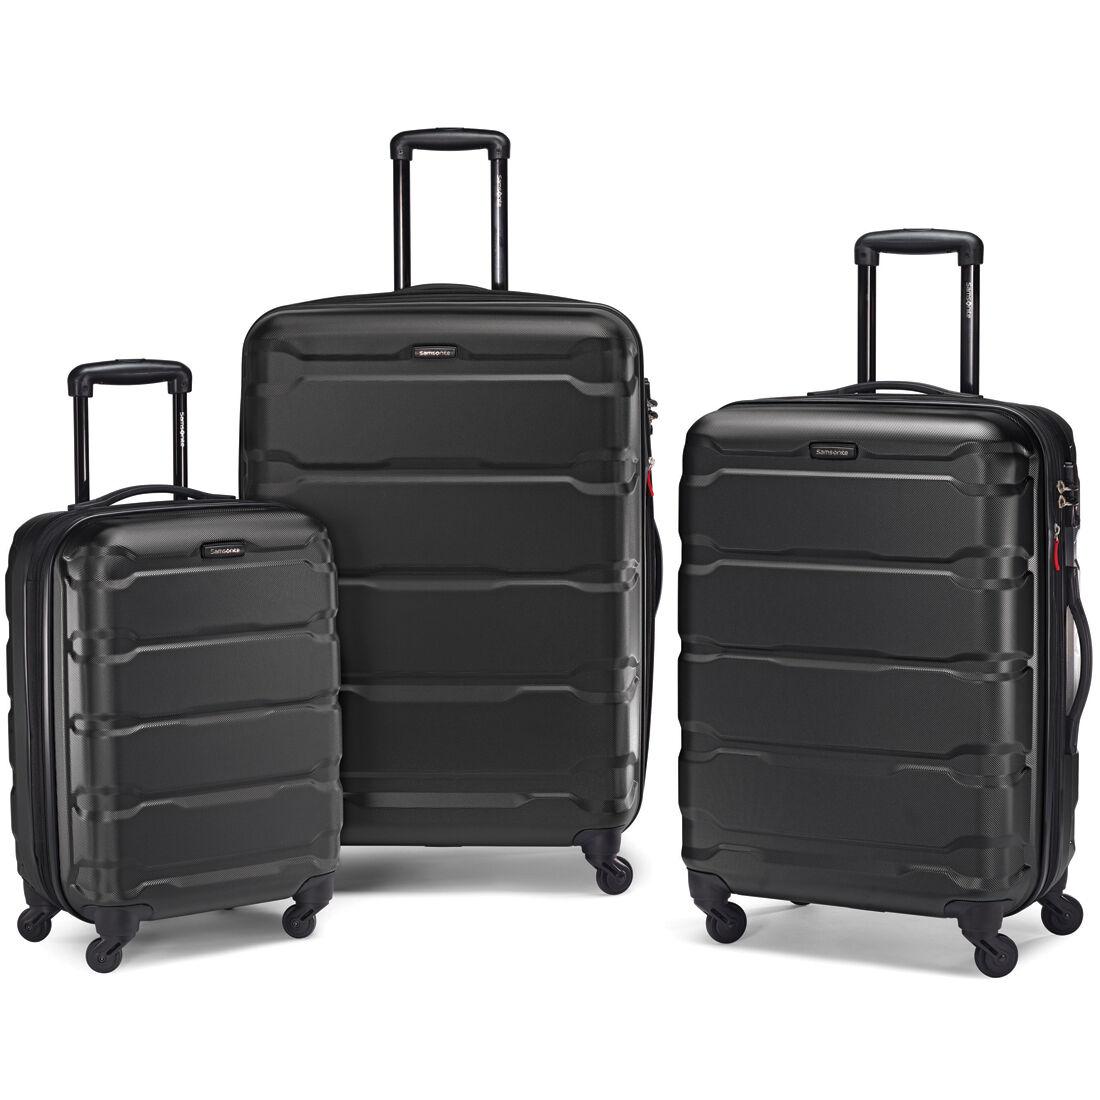 Купить Samsonite - Samsonite Omni Hardside 3 Piece Nested Spinner Luggage Set (20